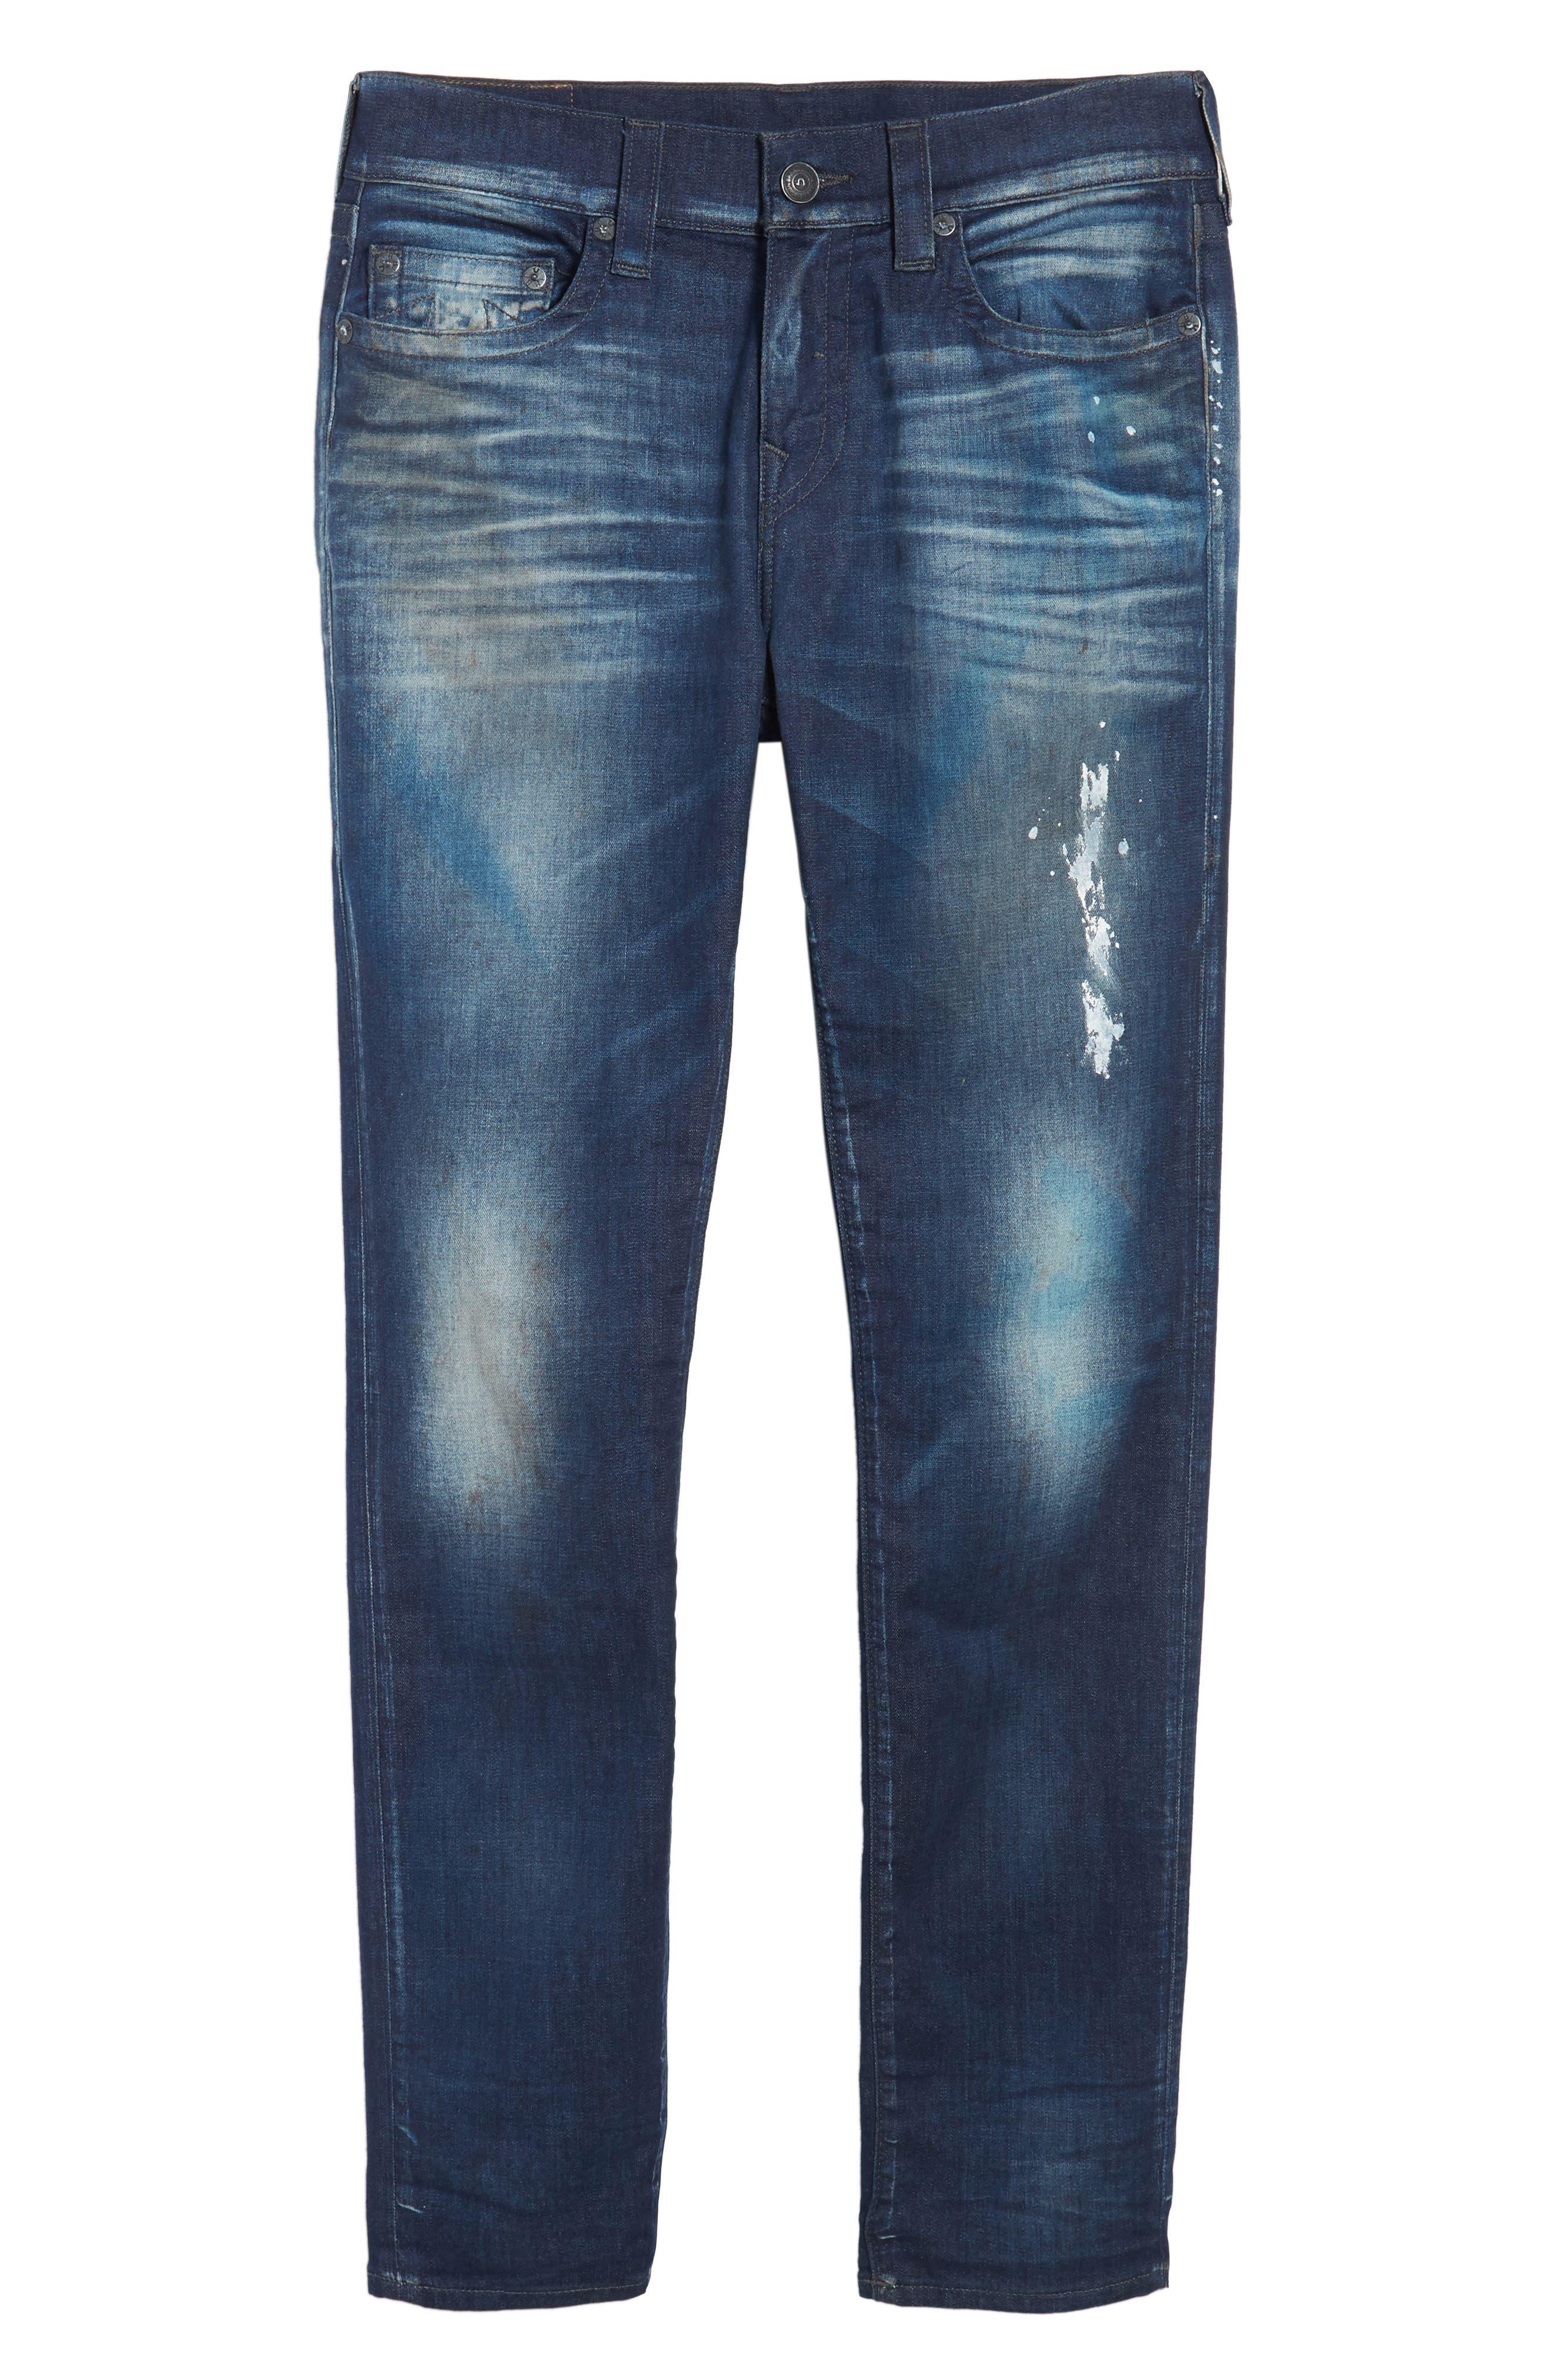 Rocco Skinny Fit Jeans,                             Alternate thumbnail 6, color,                             Loft Edge